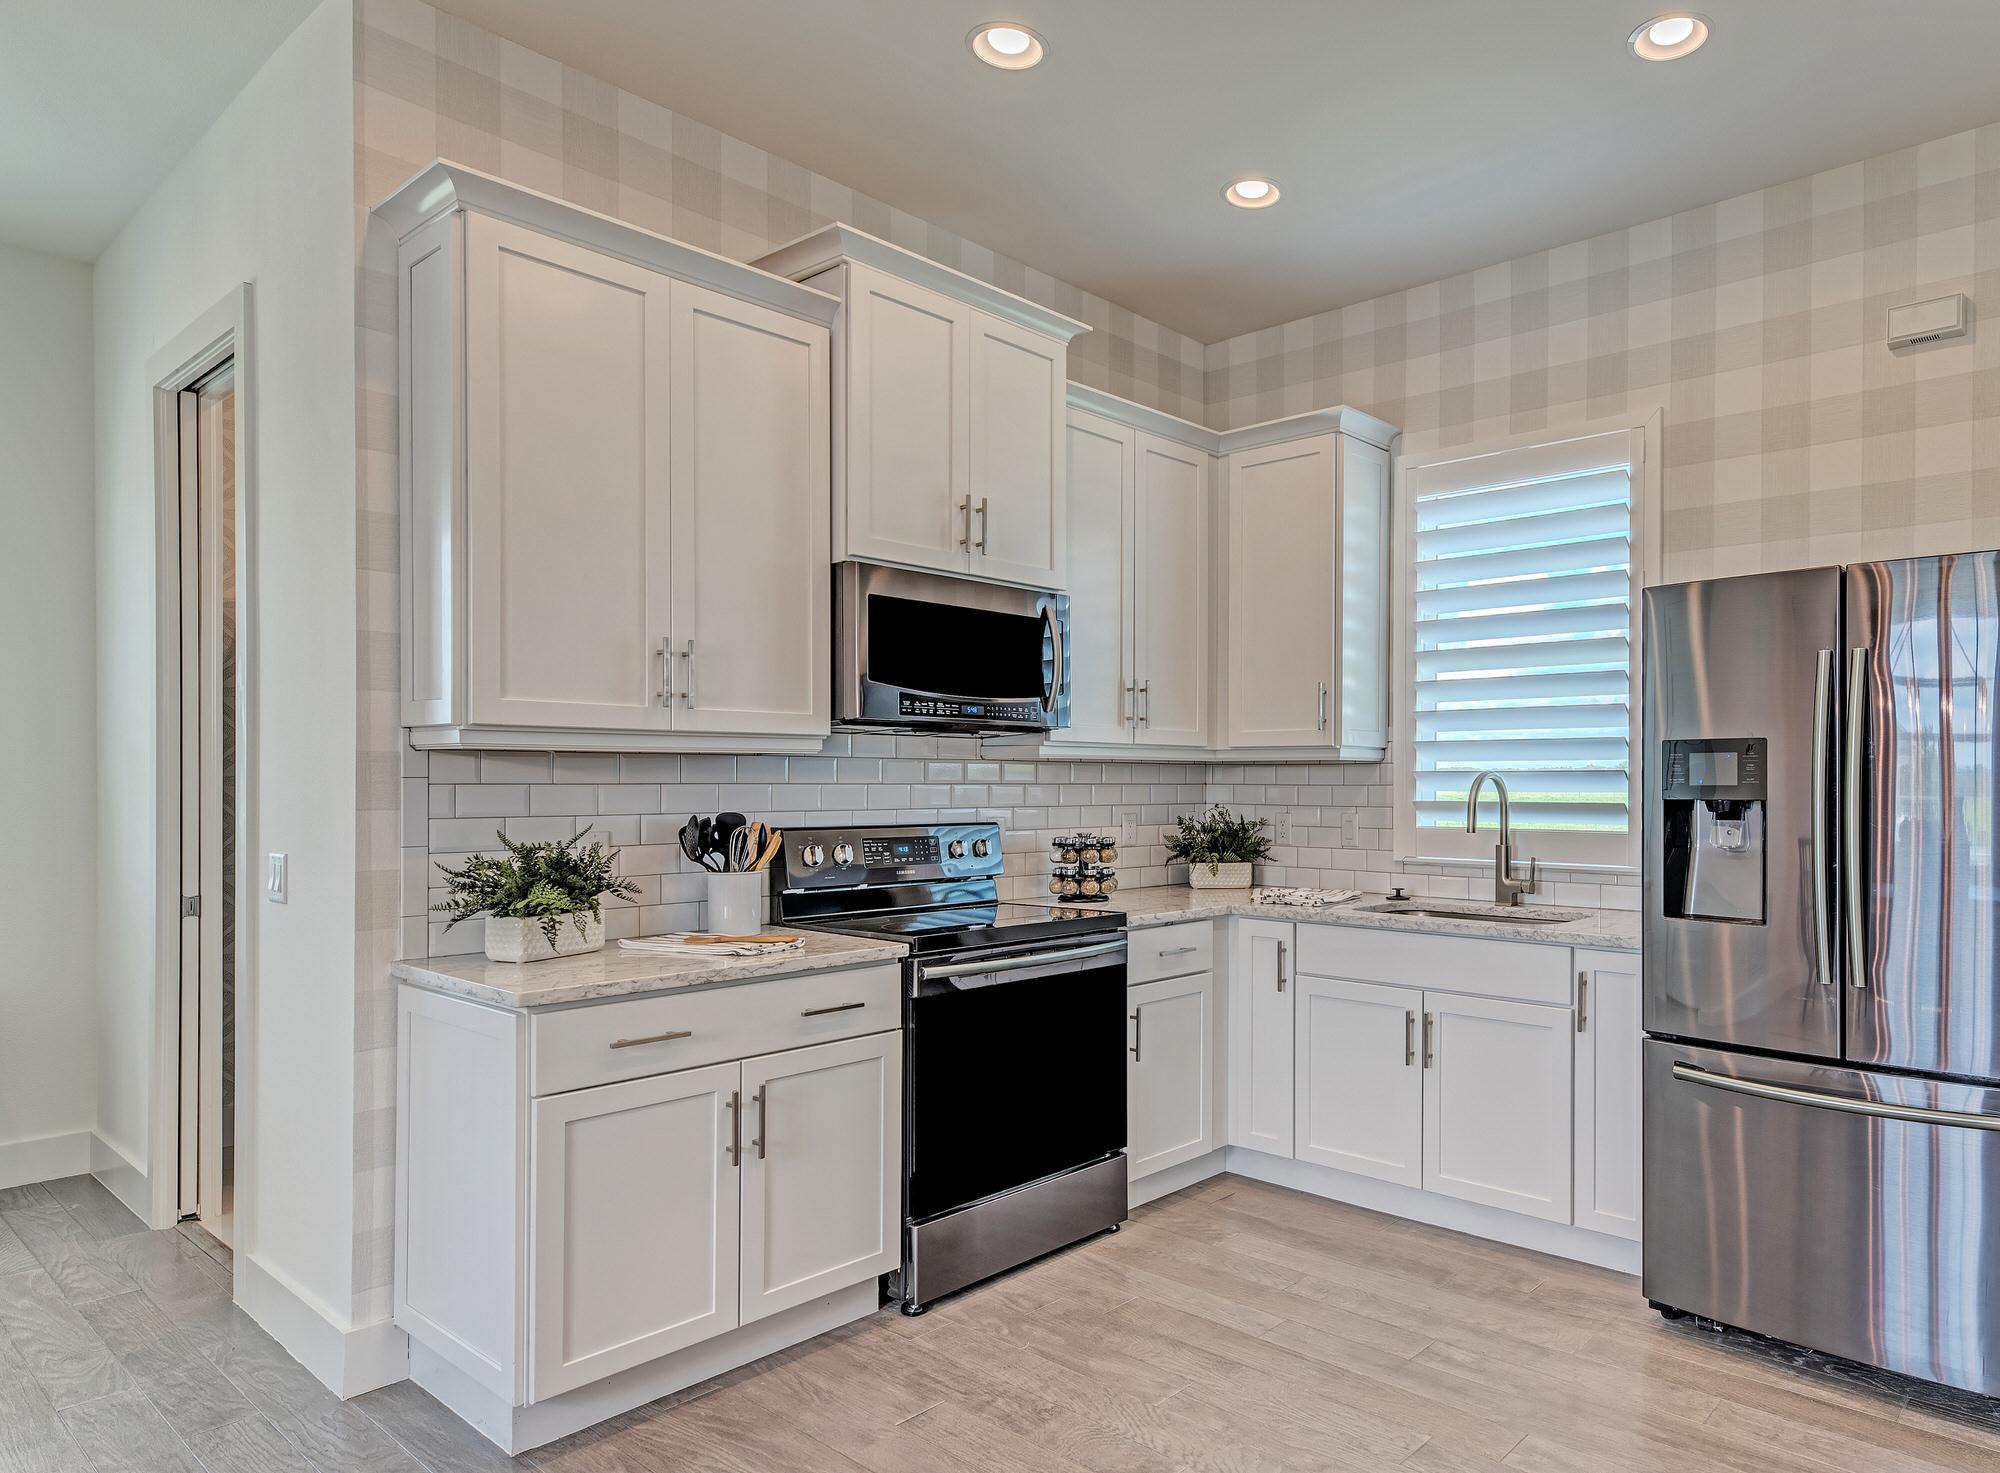 Kitchen featured in the Barbados 2800 3 Car Garage By Medallion Home in Sarasota-Bradenton, FL